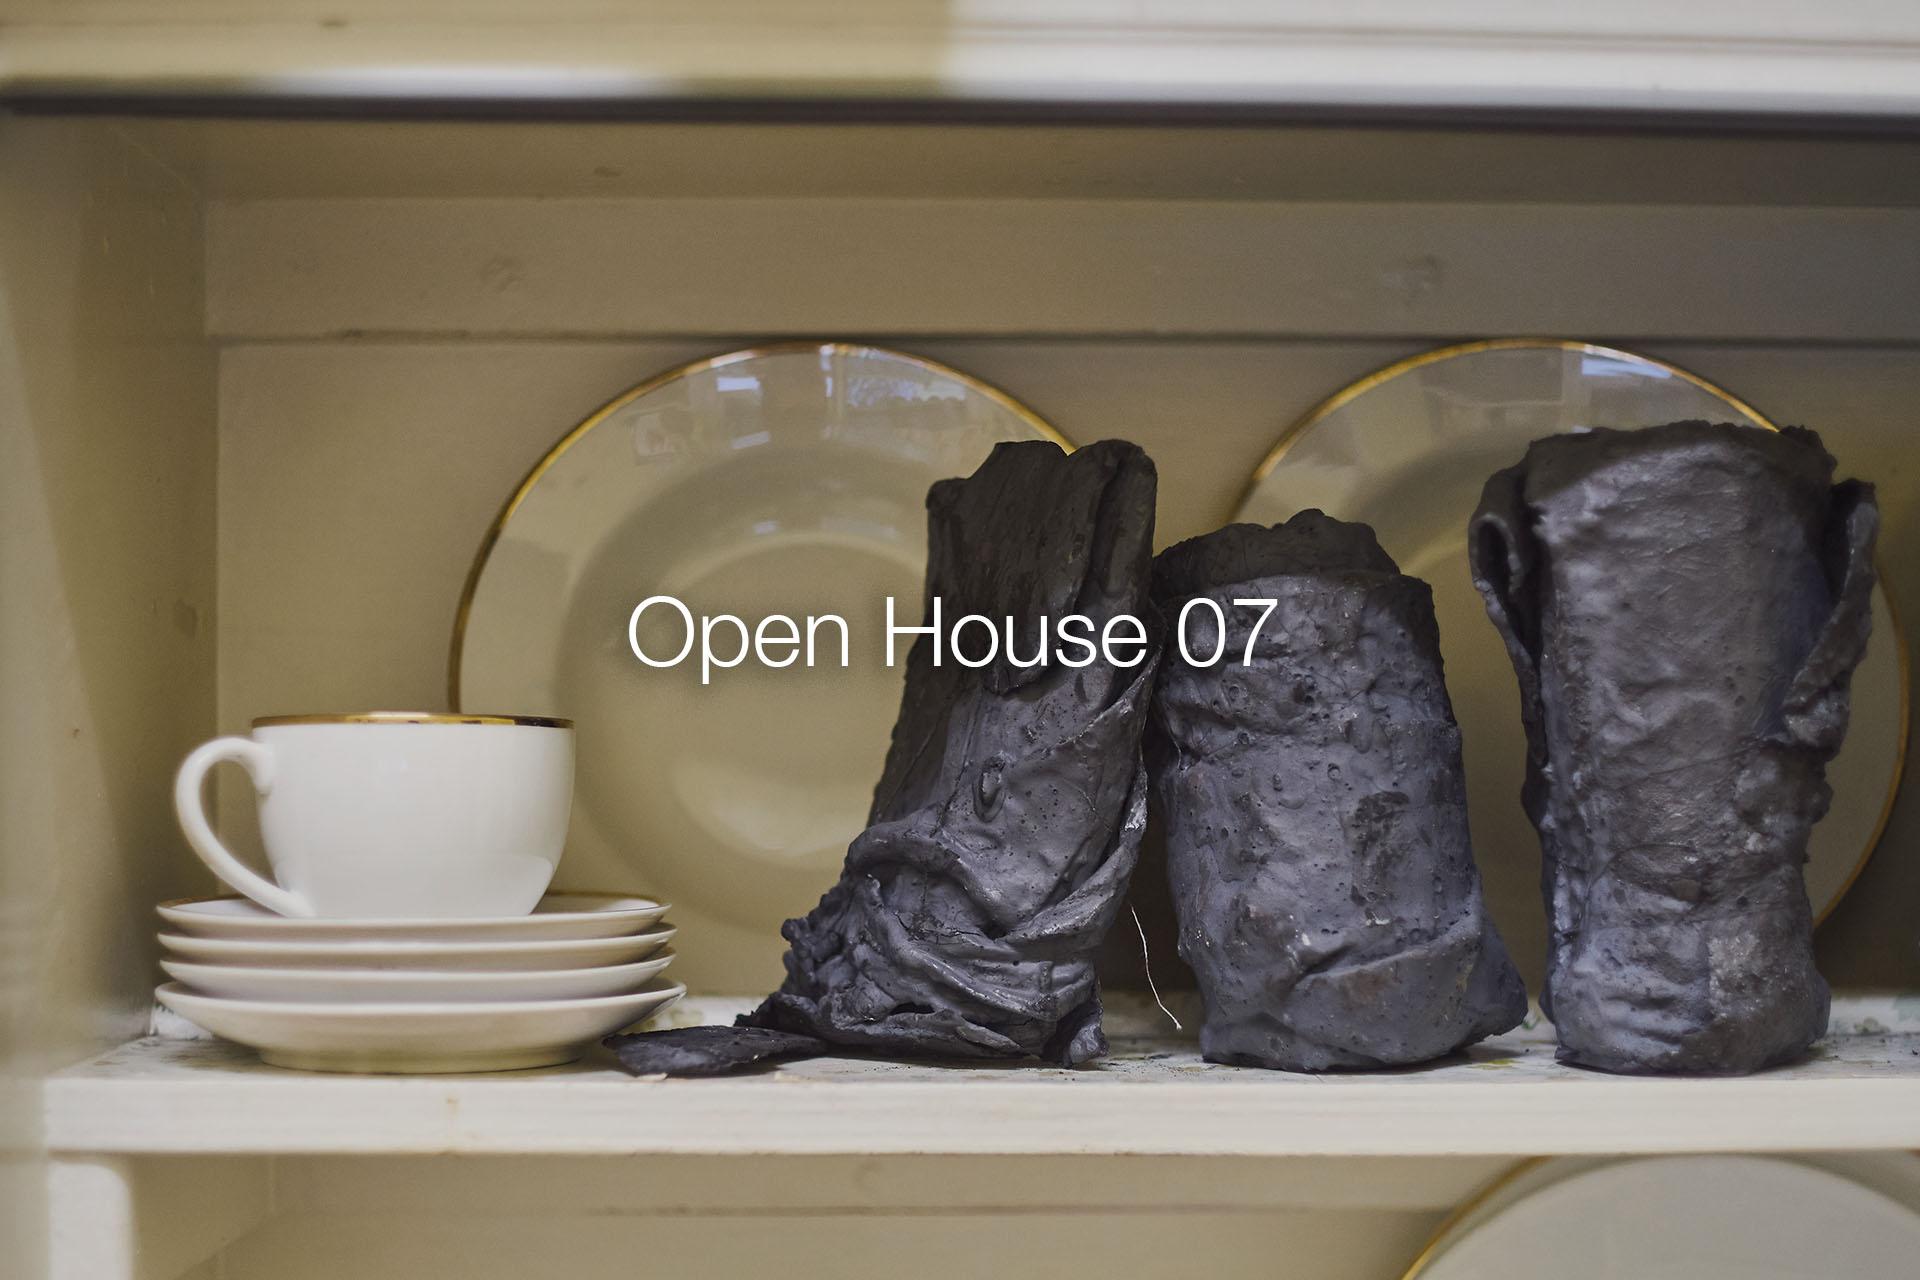 OpenHouse07.jpg